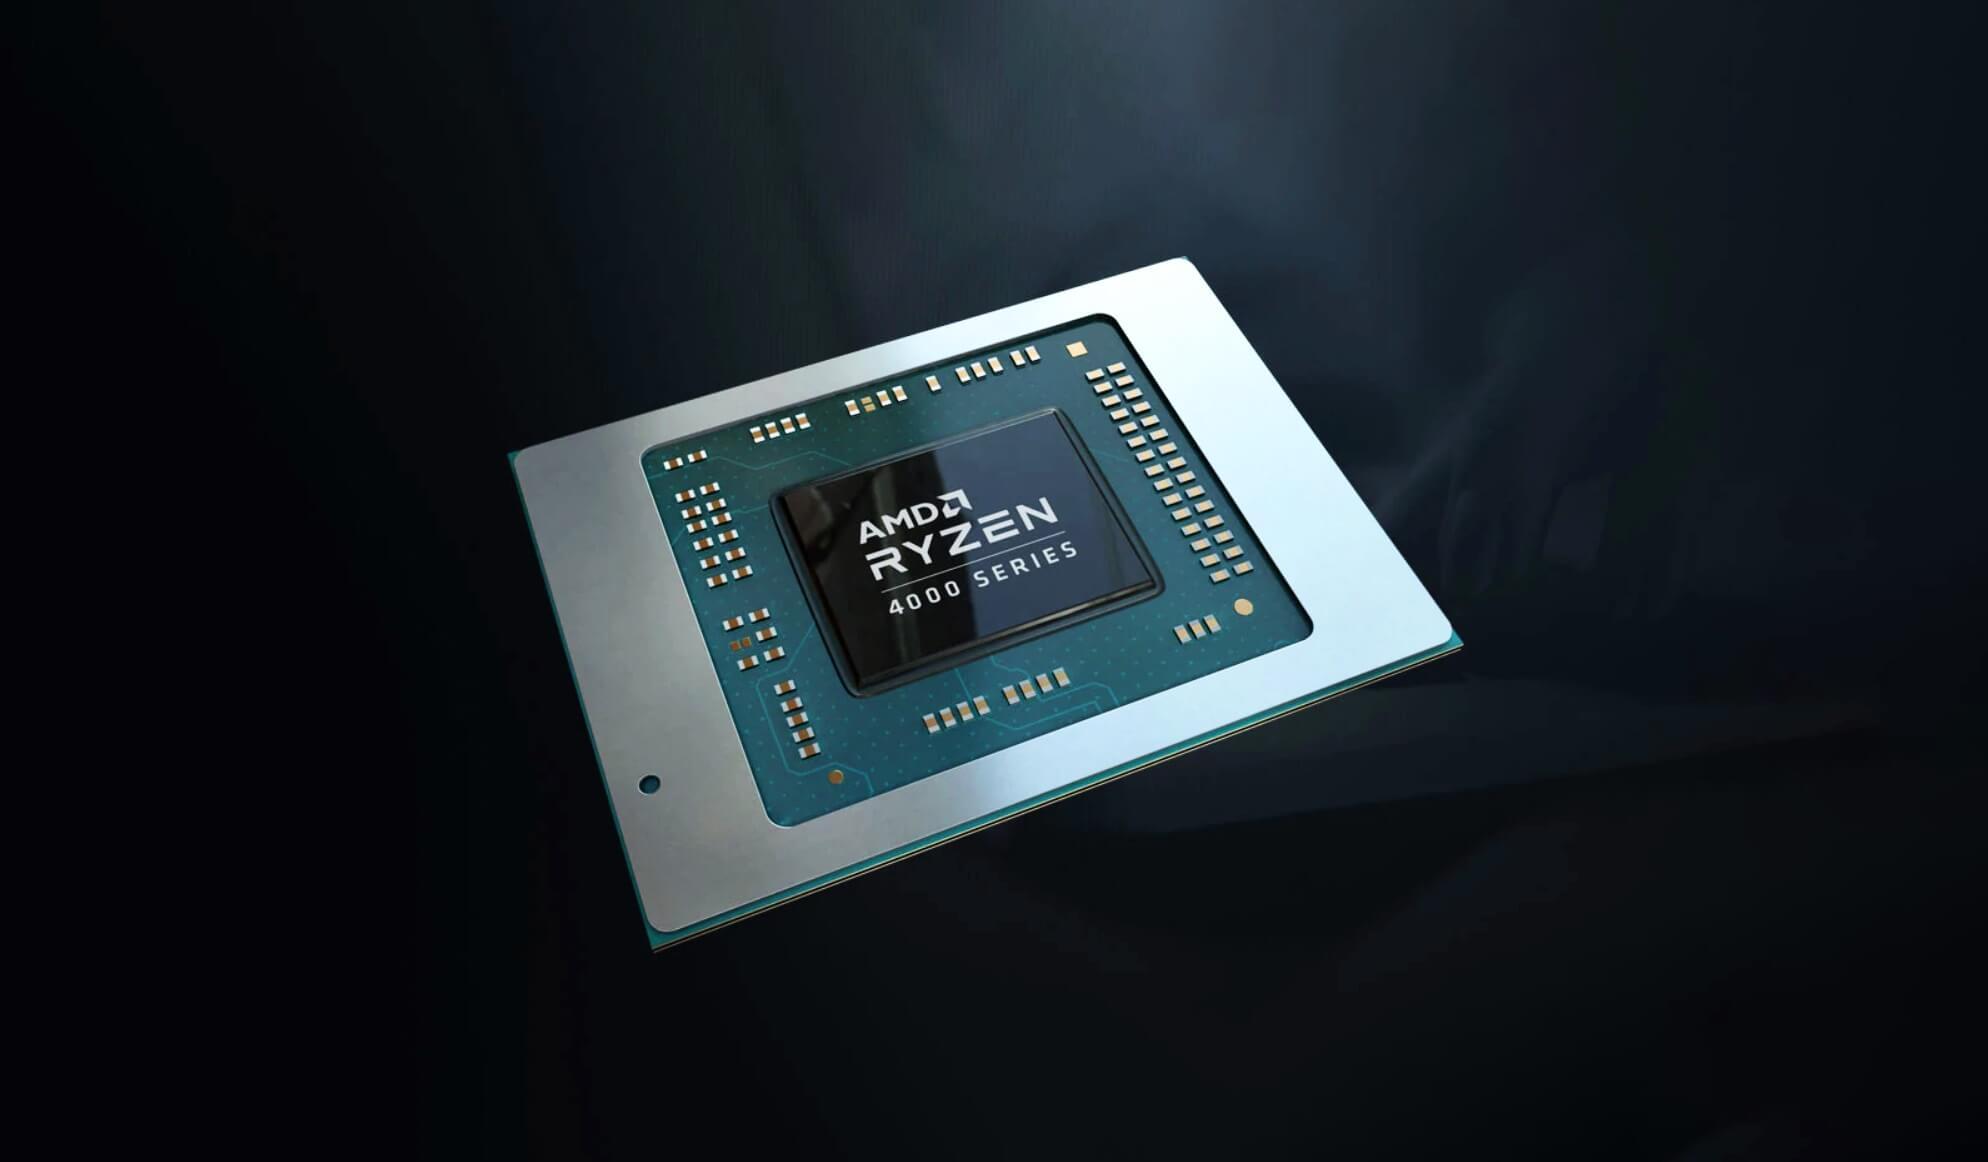 AMD Ryzen 7 4800H